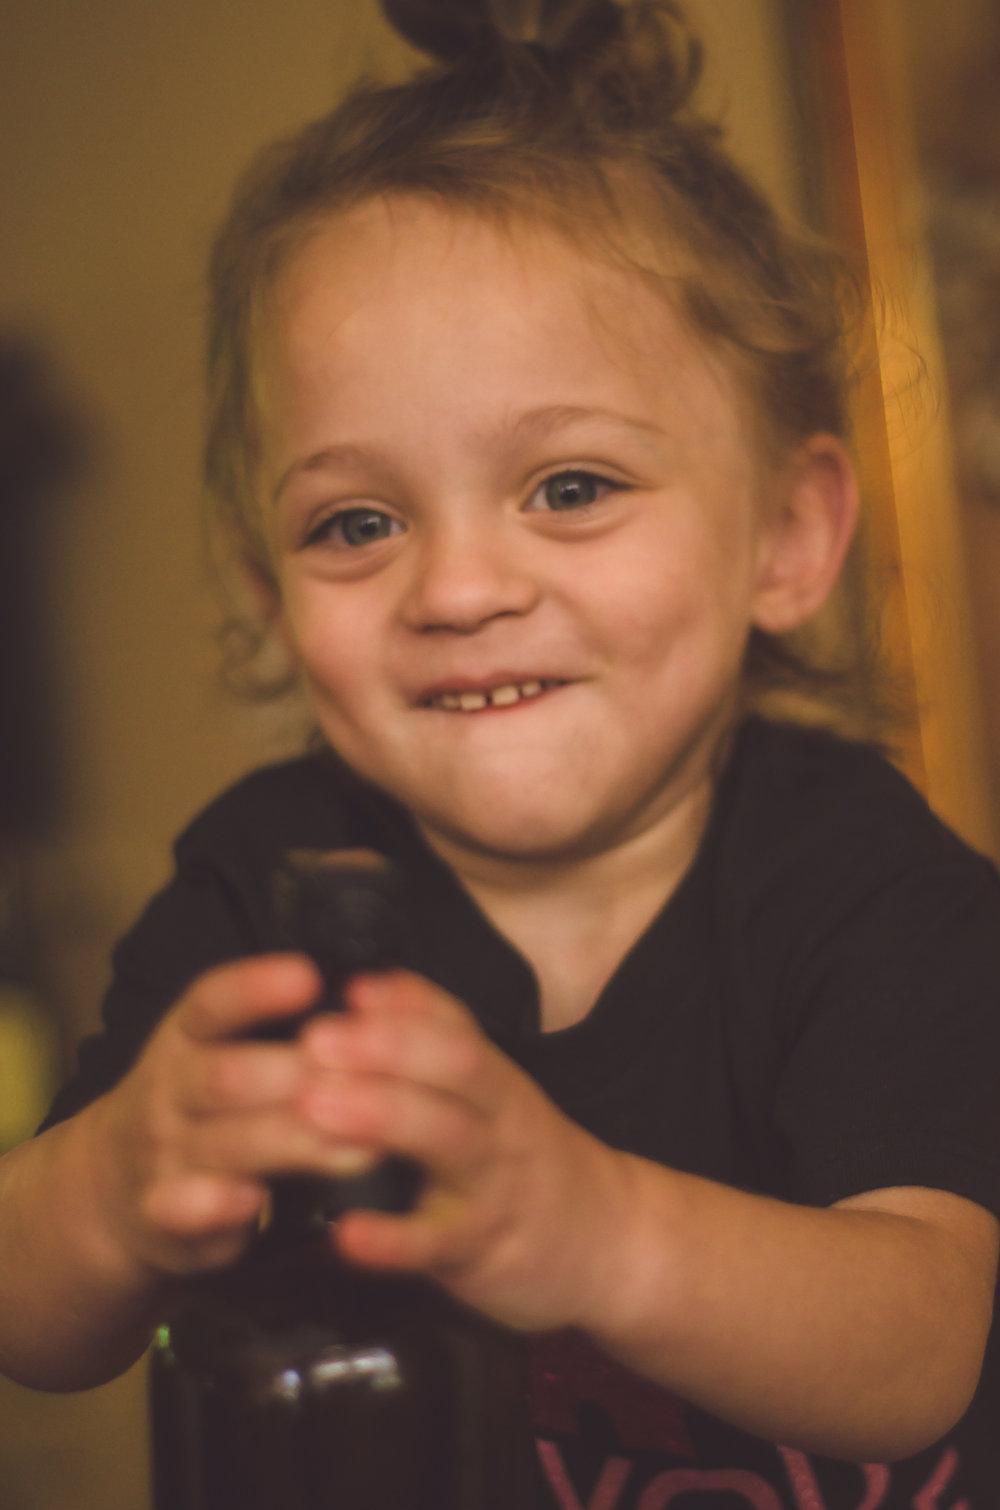 DIY Bug Spray - Non Toxic - Safe for Kids - She Got Guts